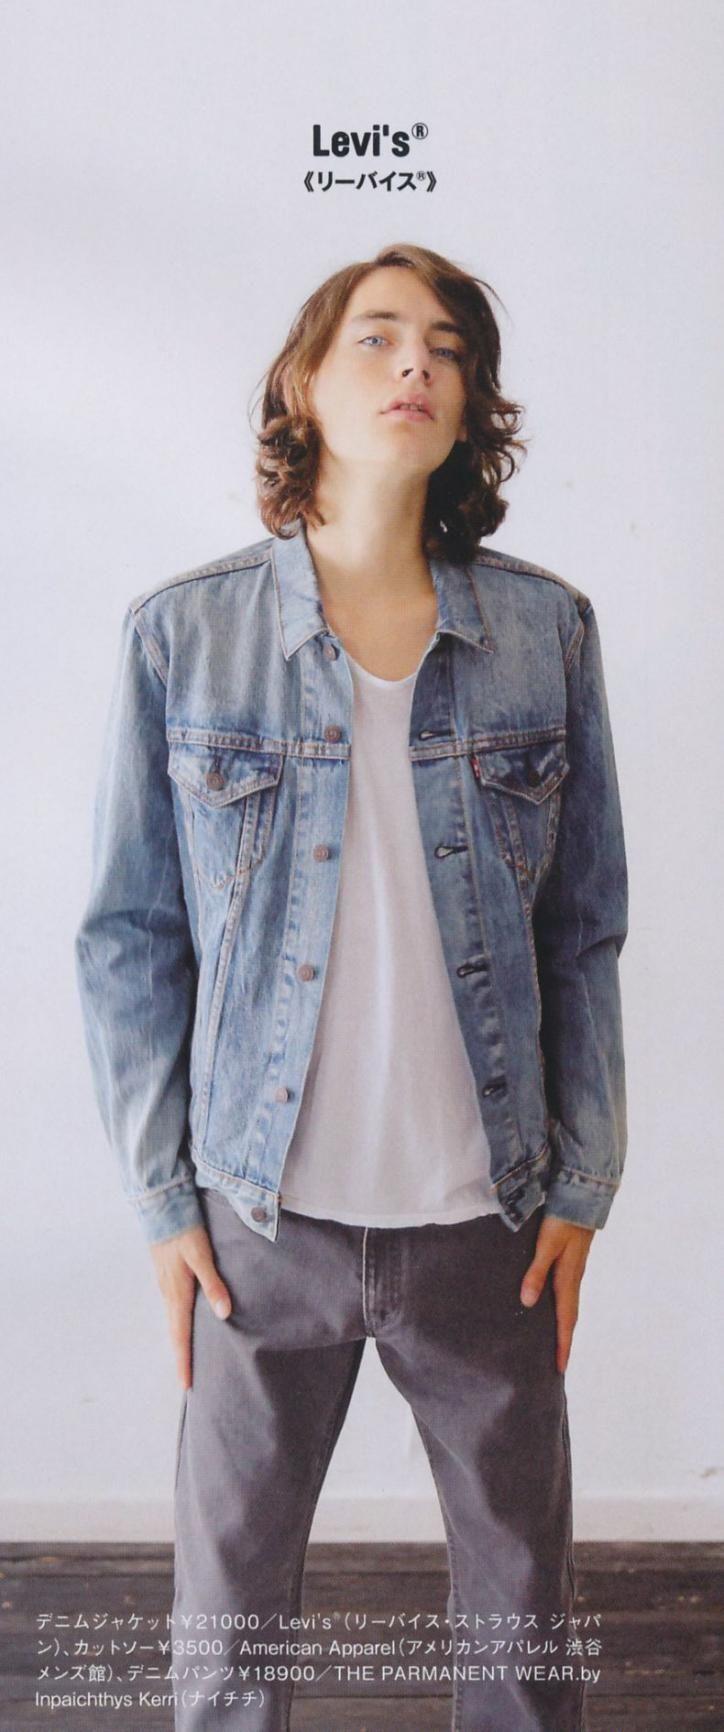 Excellent Male Model SS14 Paris Ann Demeulemeester | ファッションアイデア